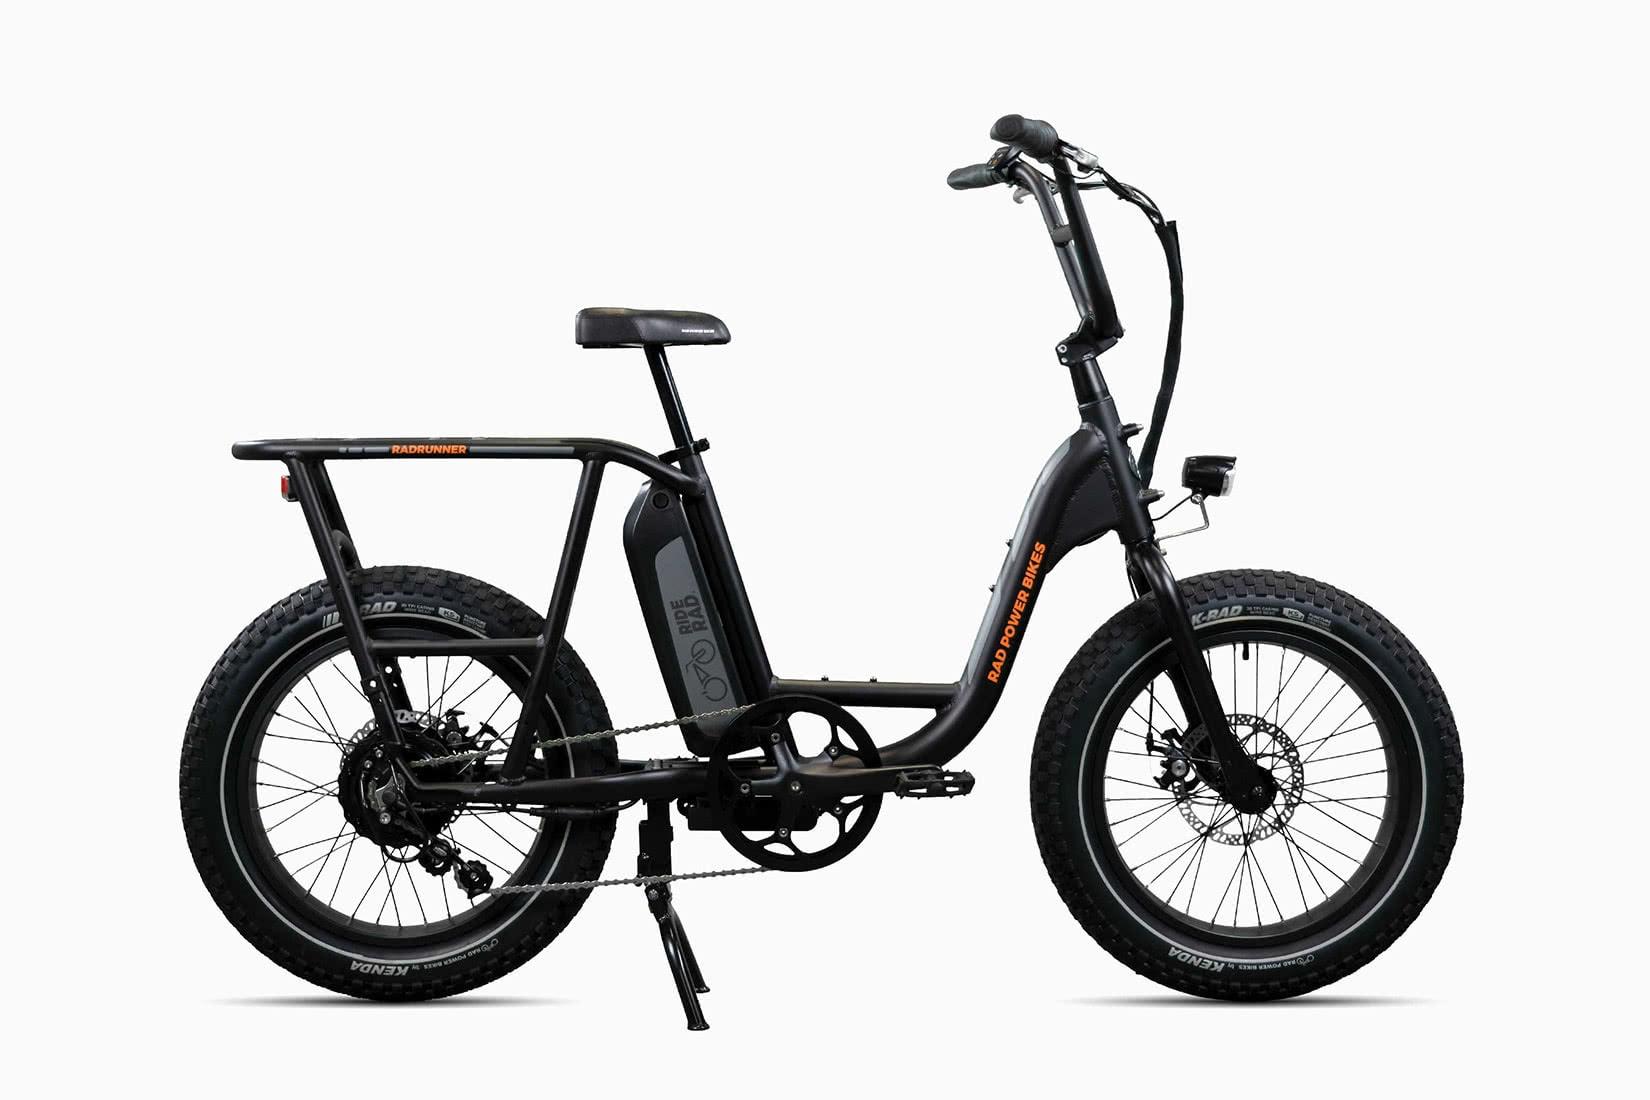 best electric bikes cargo radrunner review - Luxe Digital